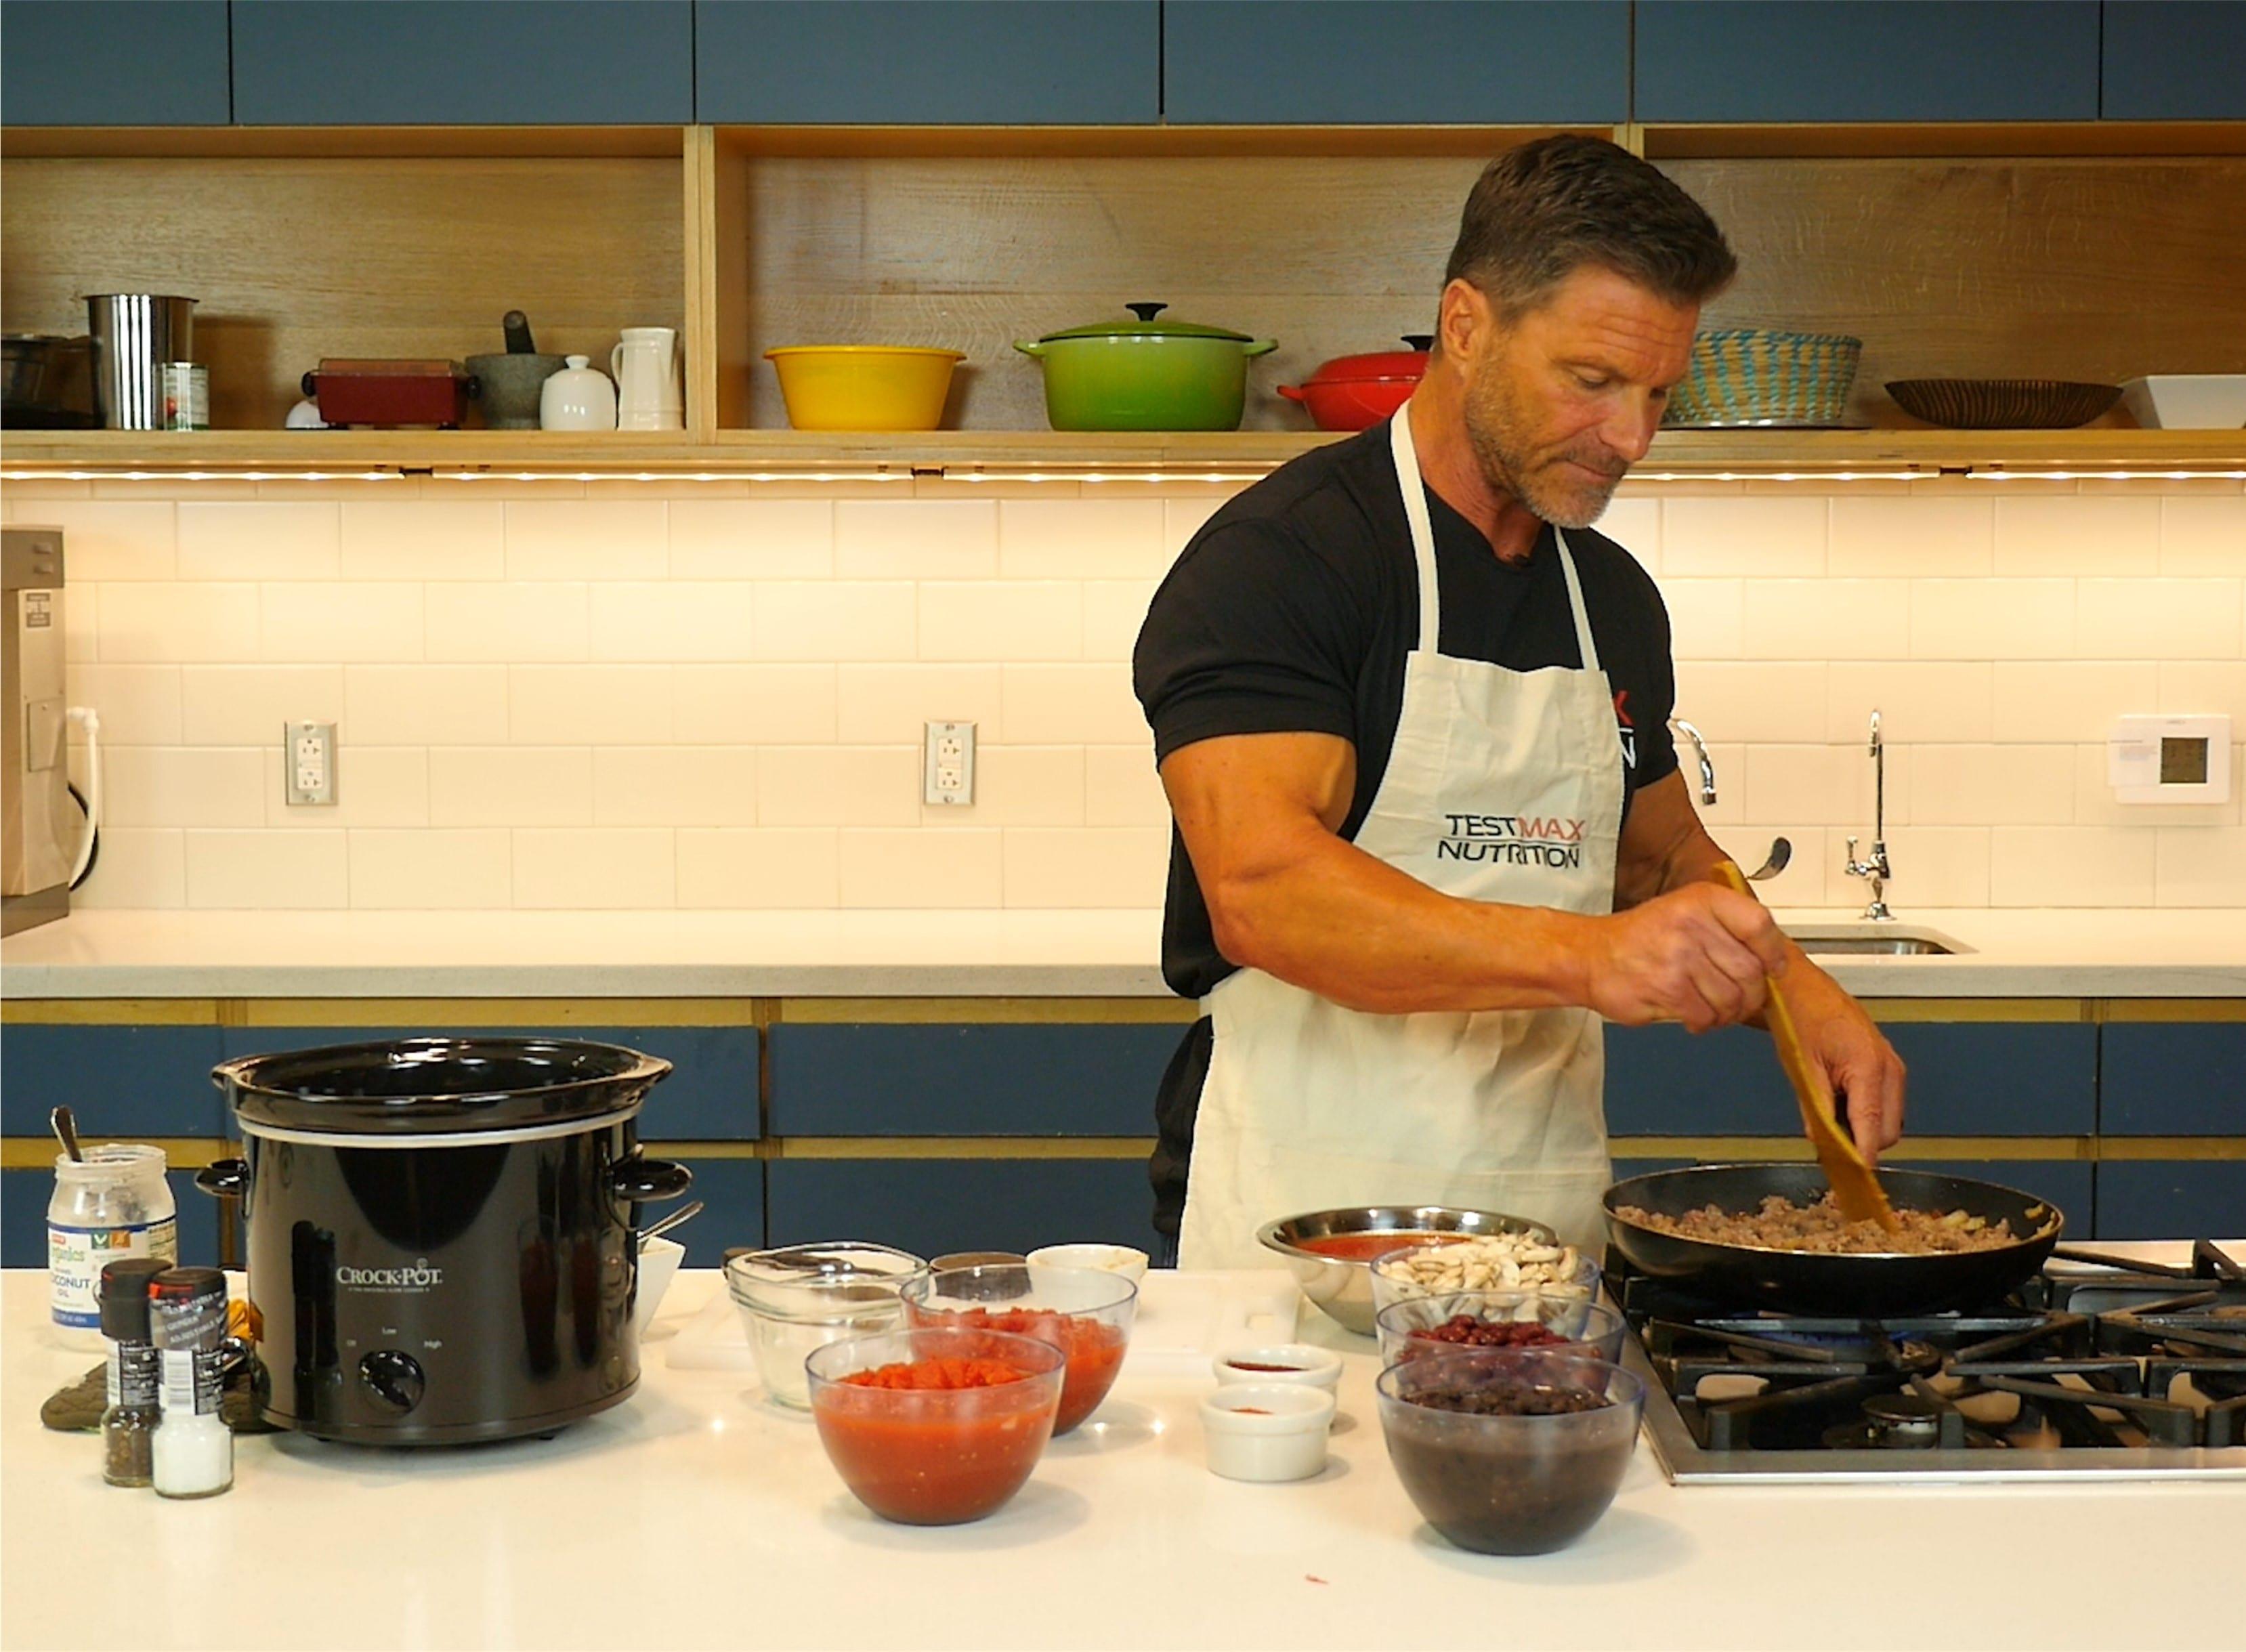 Clark Bartram's Testosterone-Boosting Chili Recipe